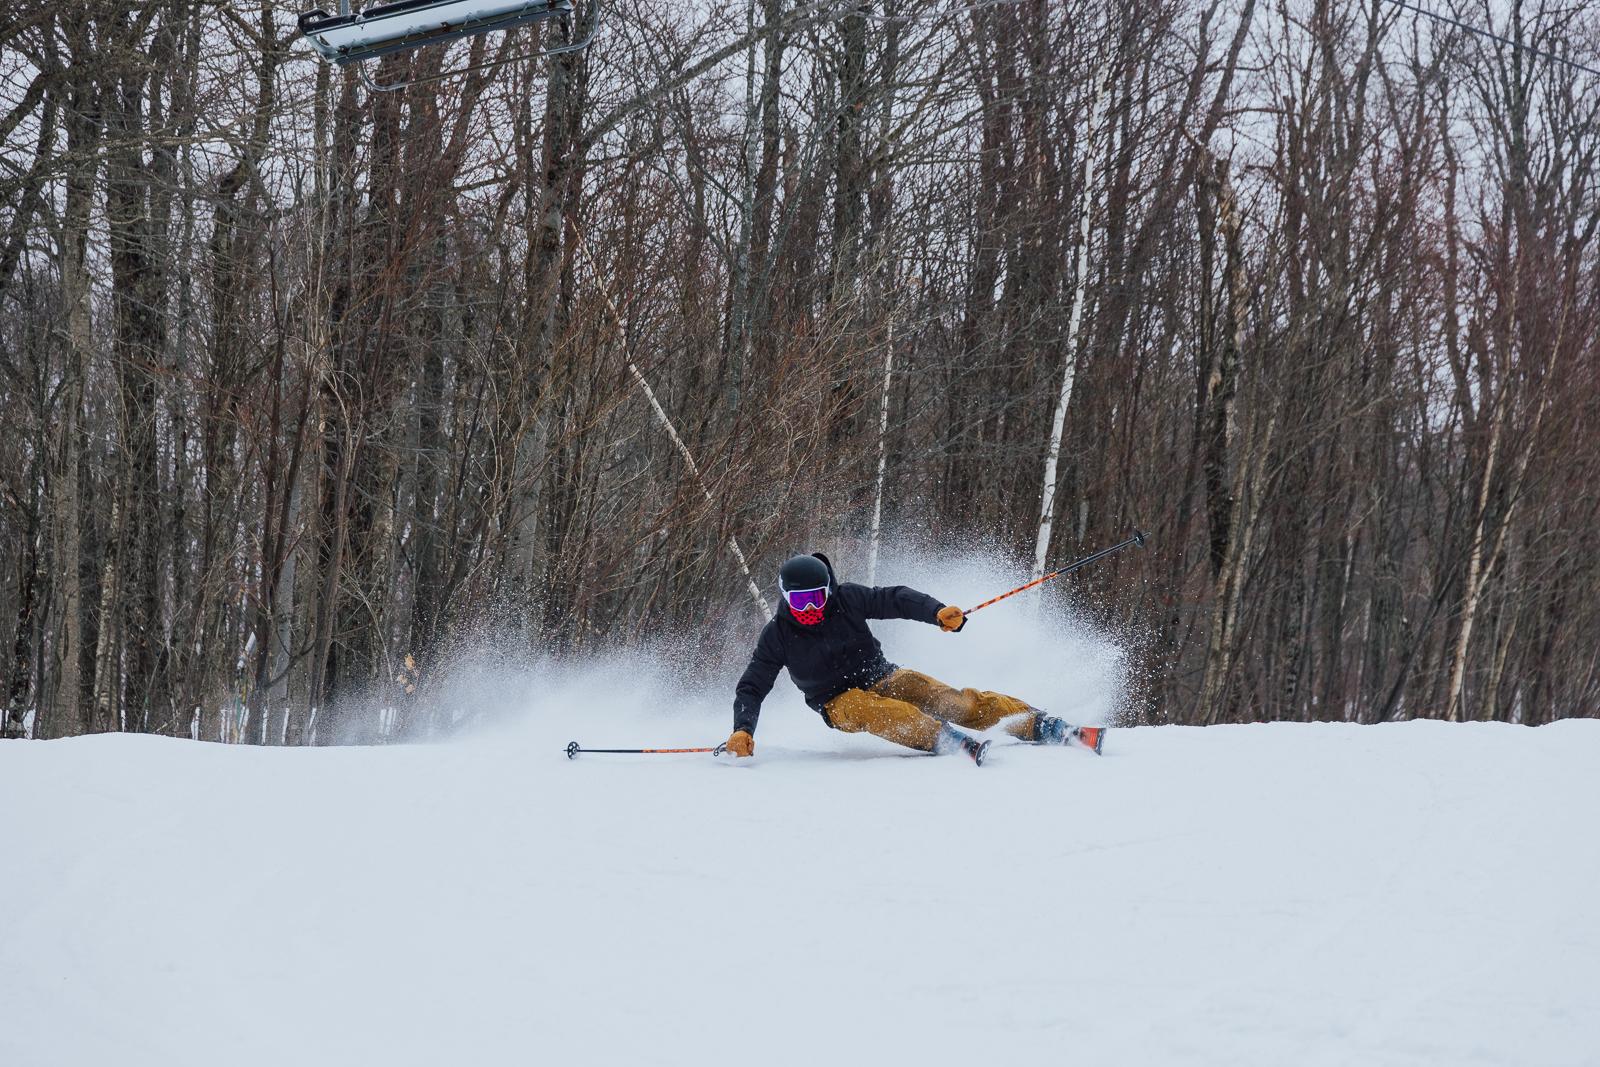 the ski monster, ski testing, ski test, blizzard skis, Nordica enforcer, elan ripstick, Volkl mantra